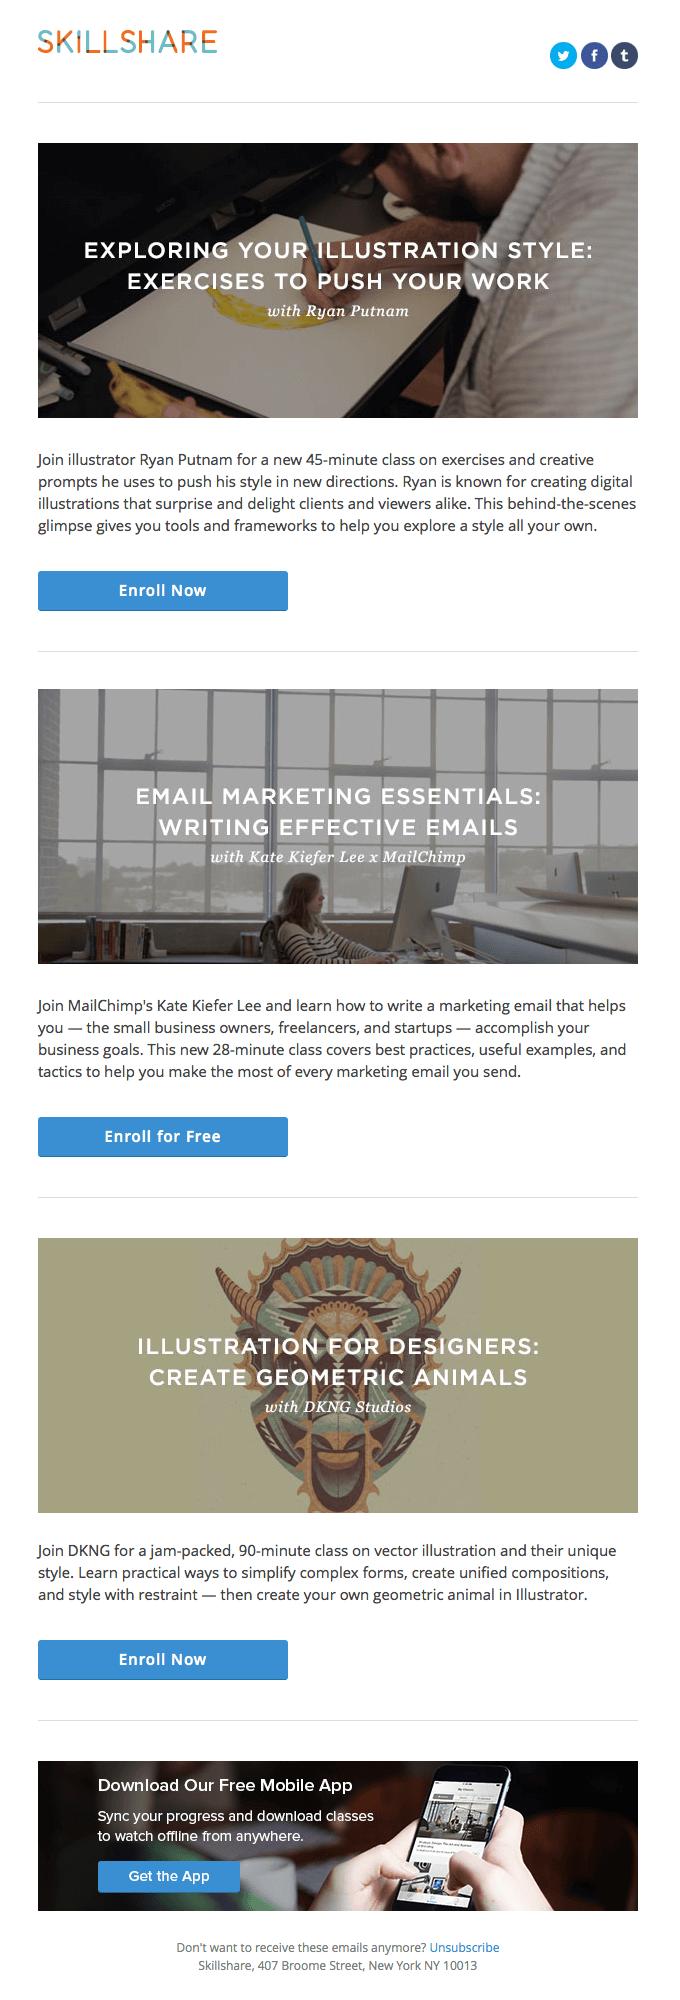 Academic email inspiration-Skillshare